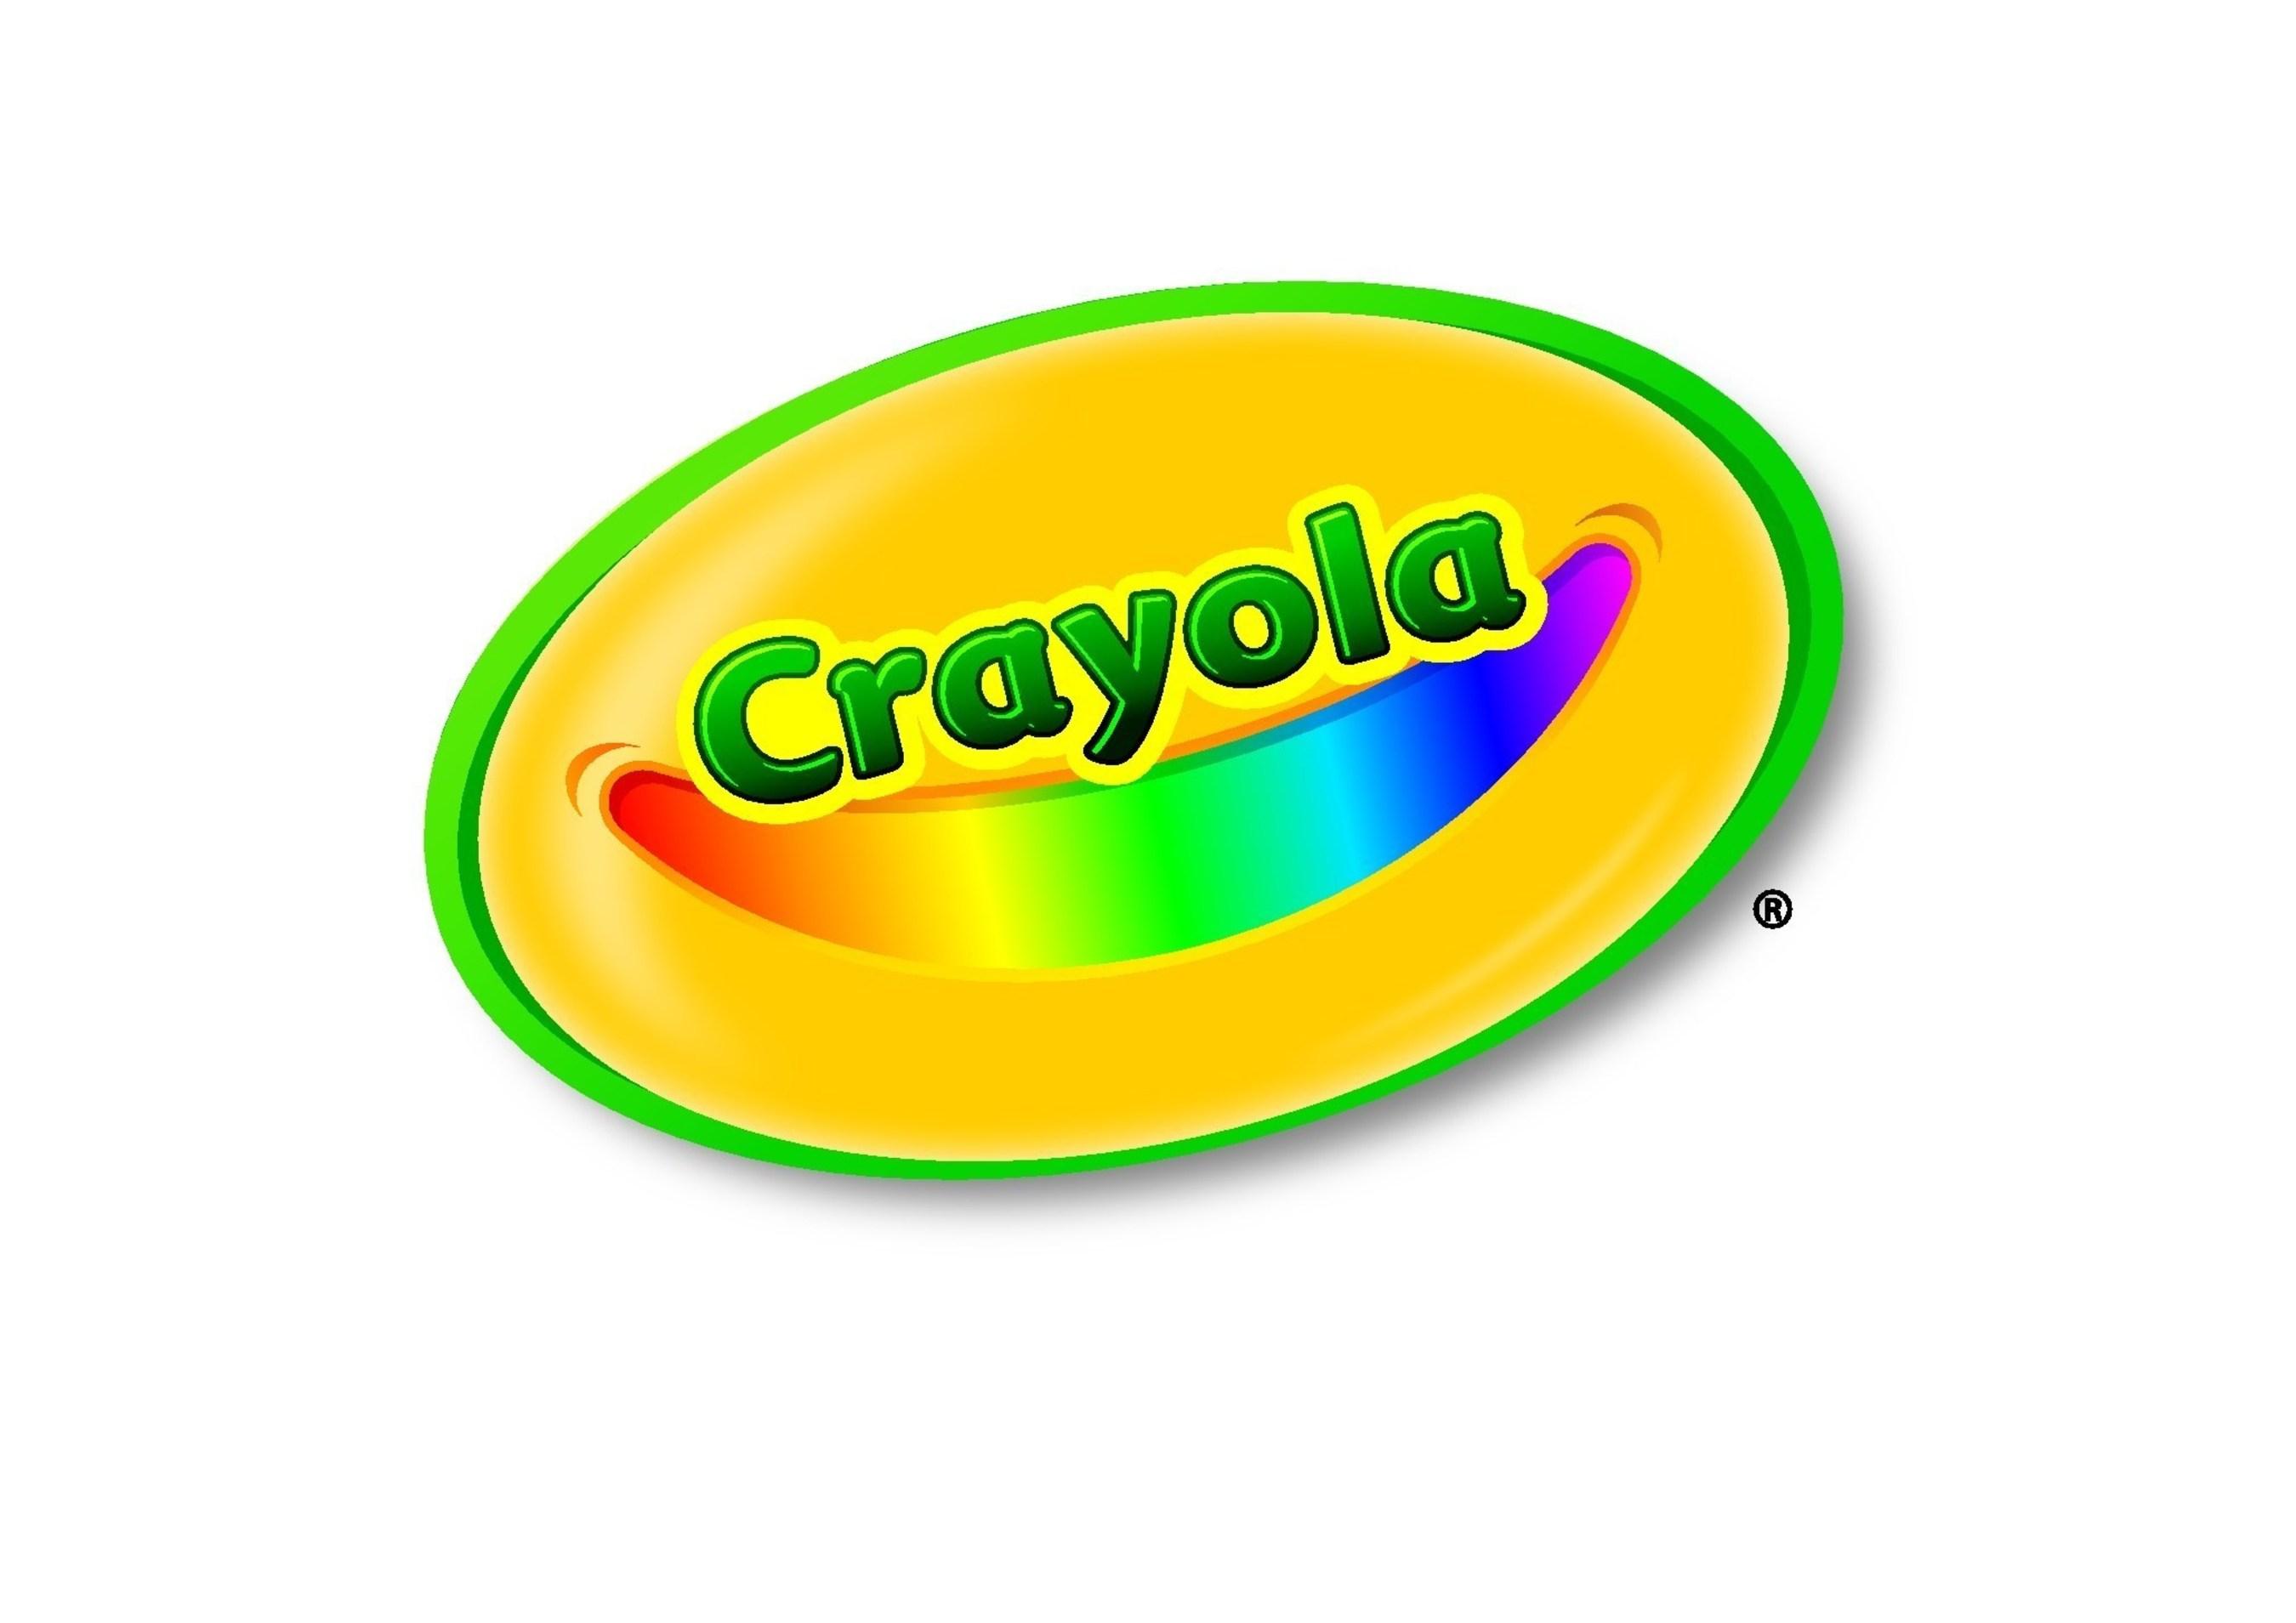 https://www.anrdoezrs.net/links/8889751/type/dlg/https://www.crayola.com/